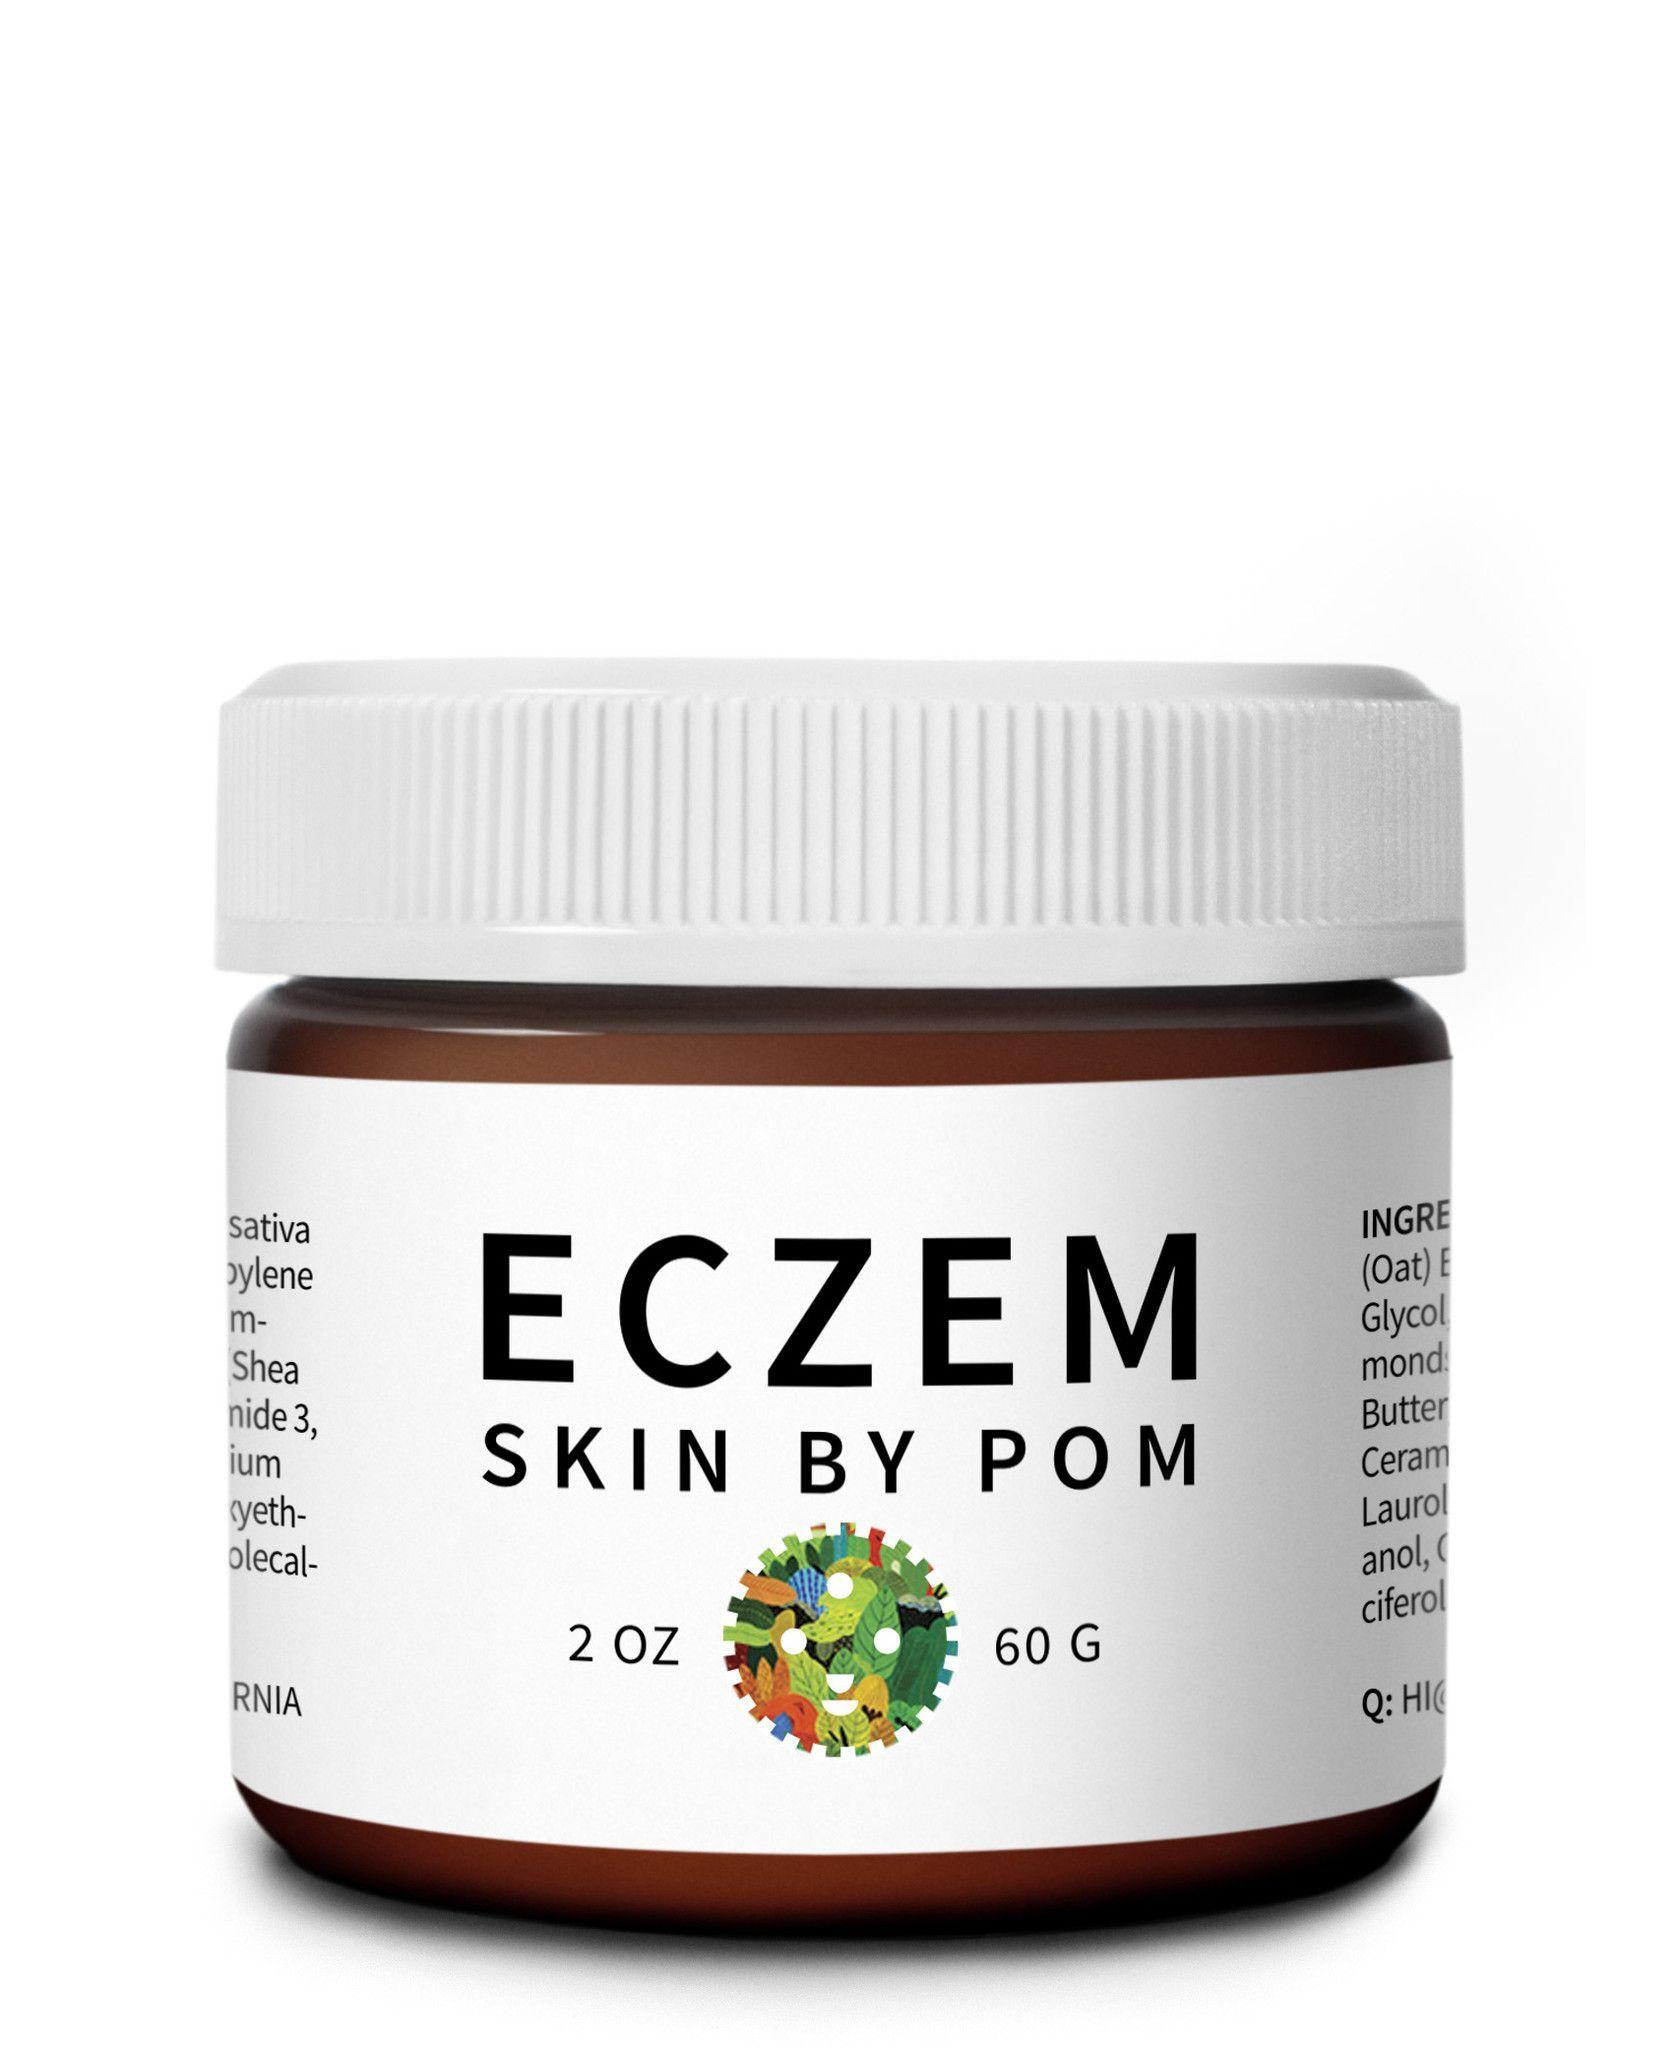 ECZEM B & D Vitamin Deeply Moisturizing Cream for Eczema